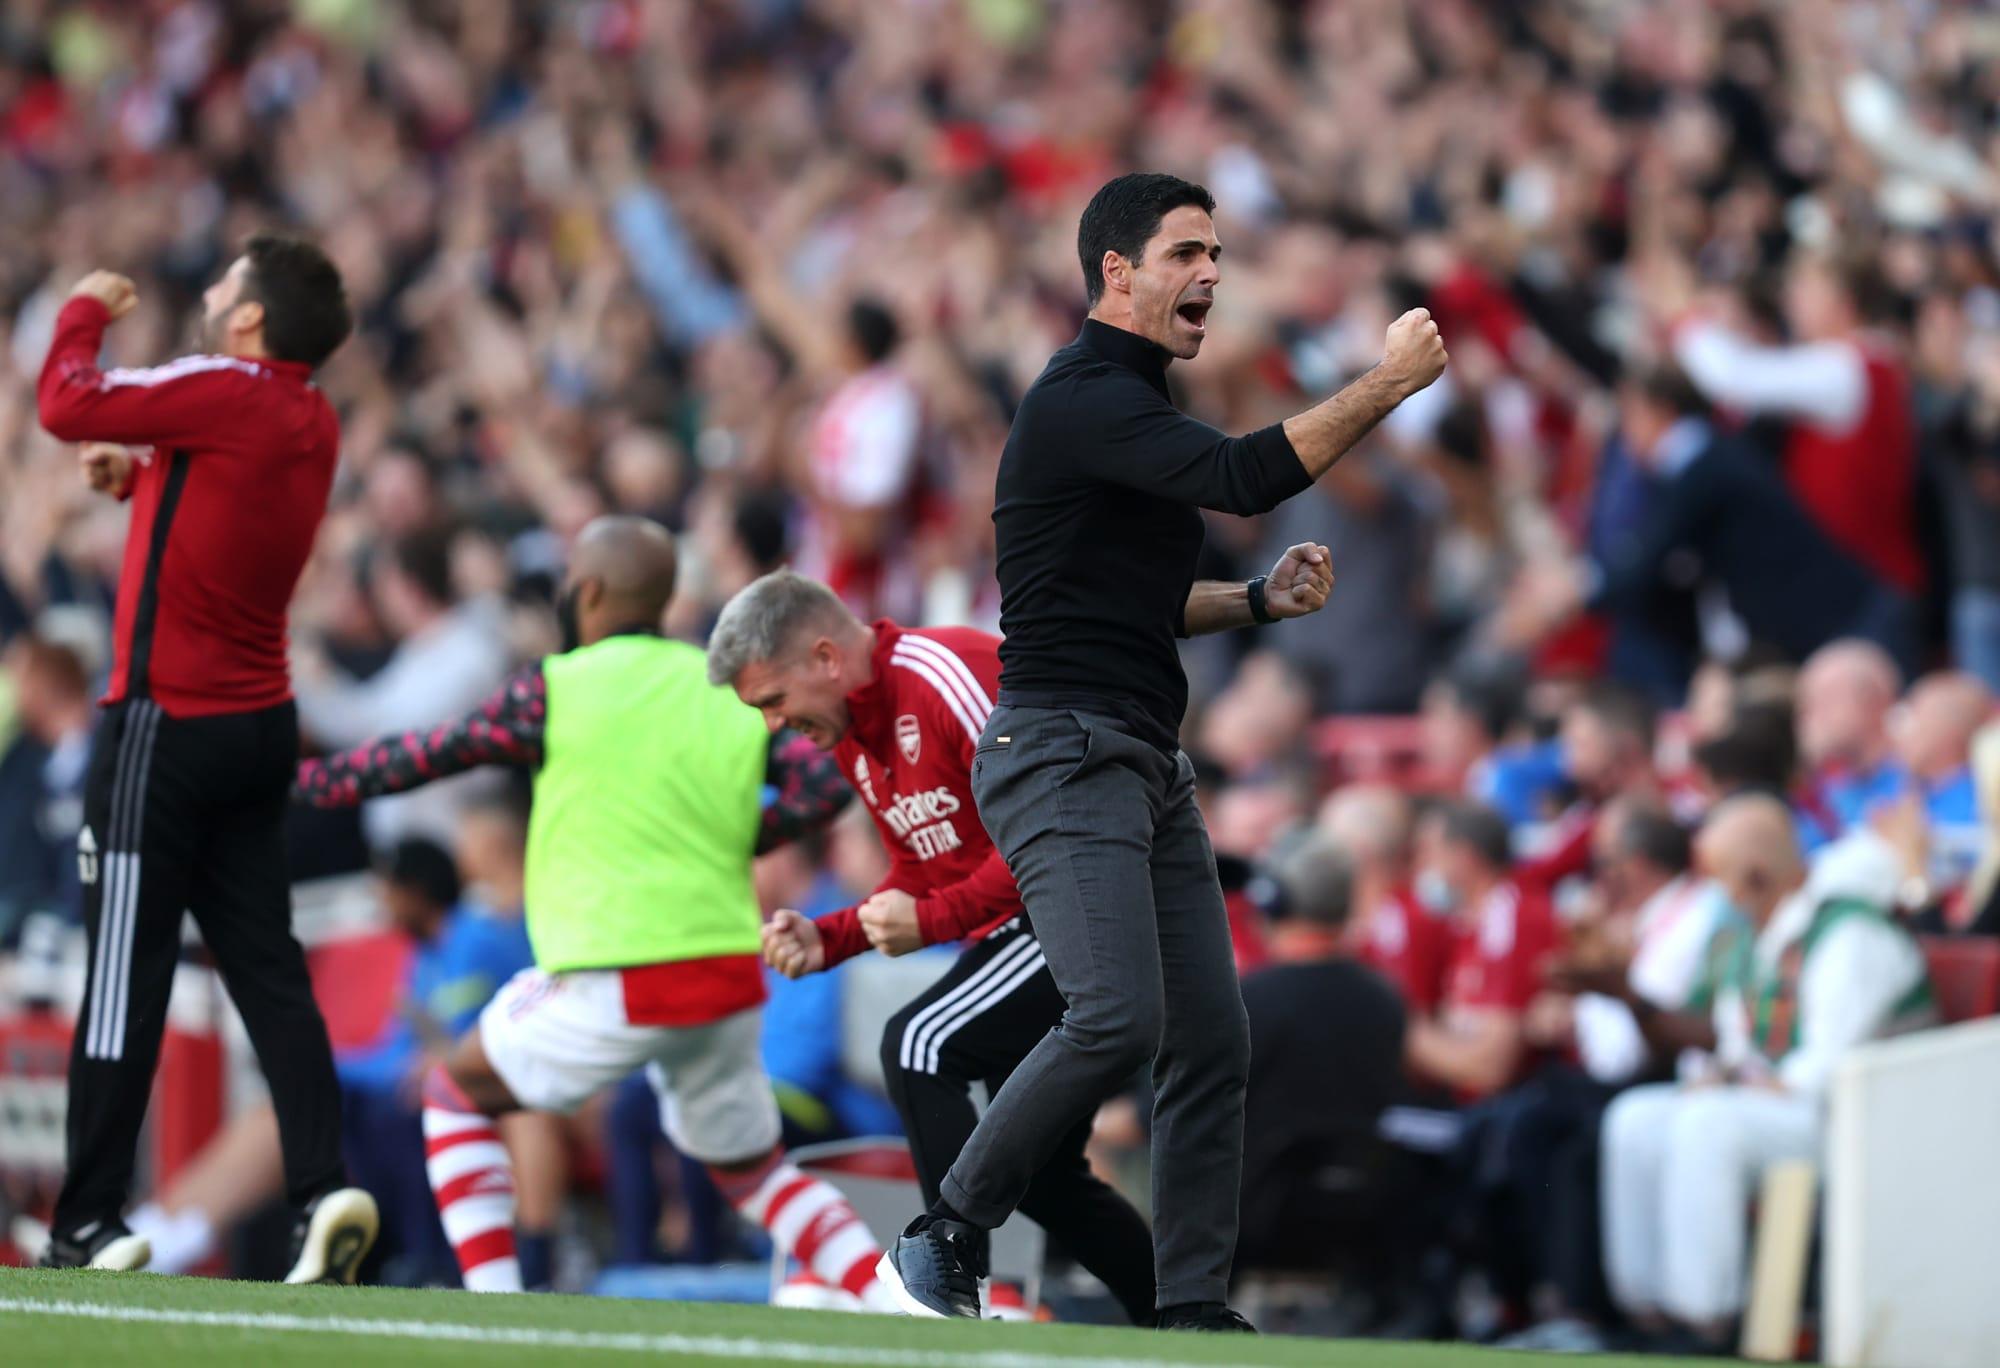 This is a huge week for Arteta's Arsenal Football Club